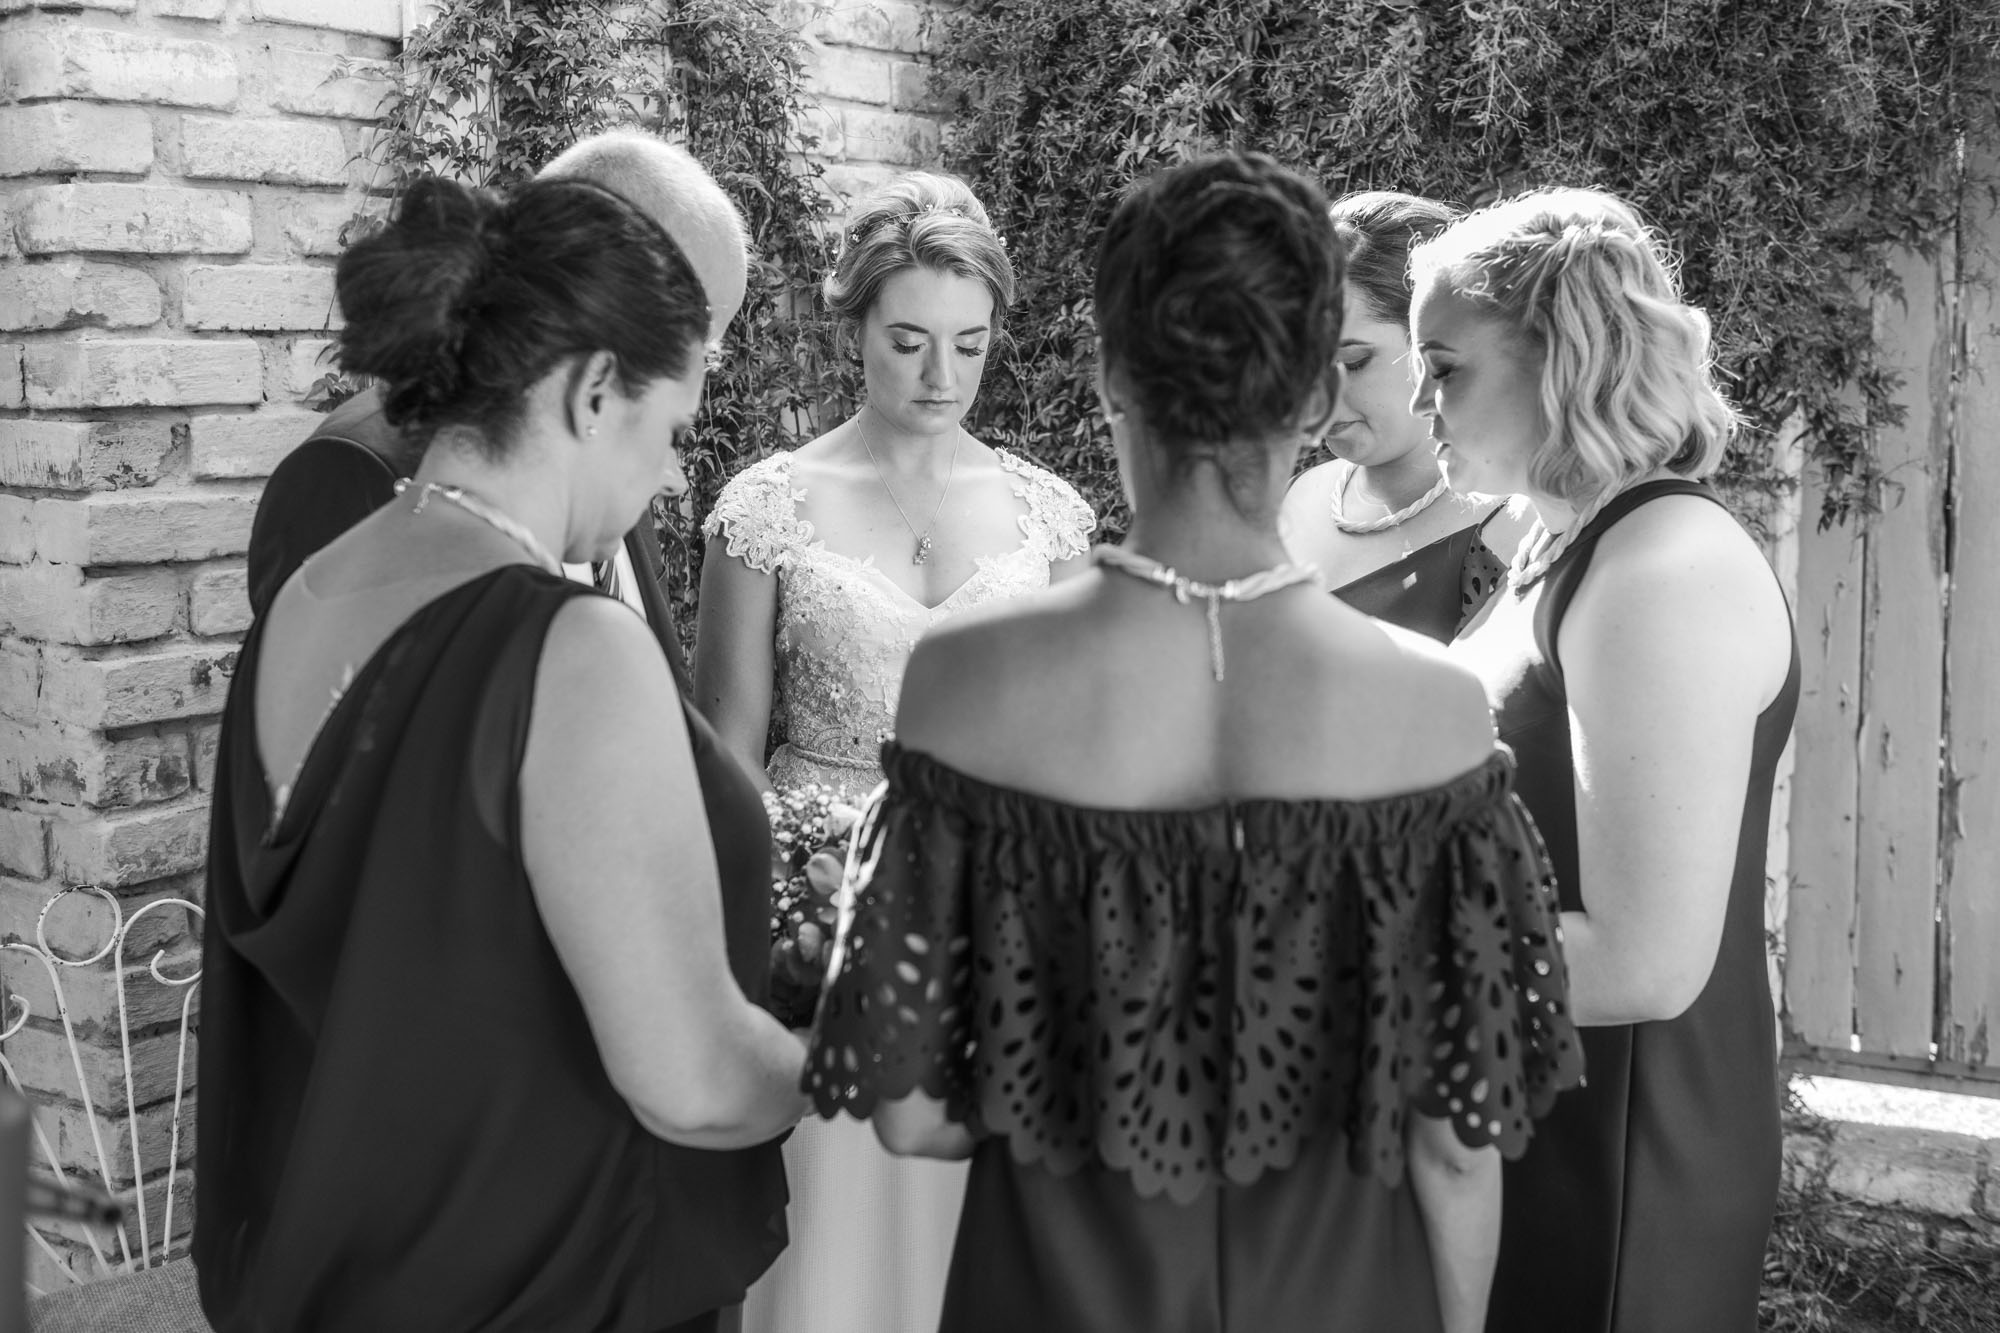 085a-affordable-wedding-photographers-johannesburg085a-affordable-wedding-photographers-johannesburg_a.jpg